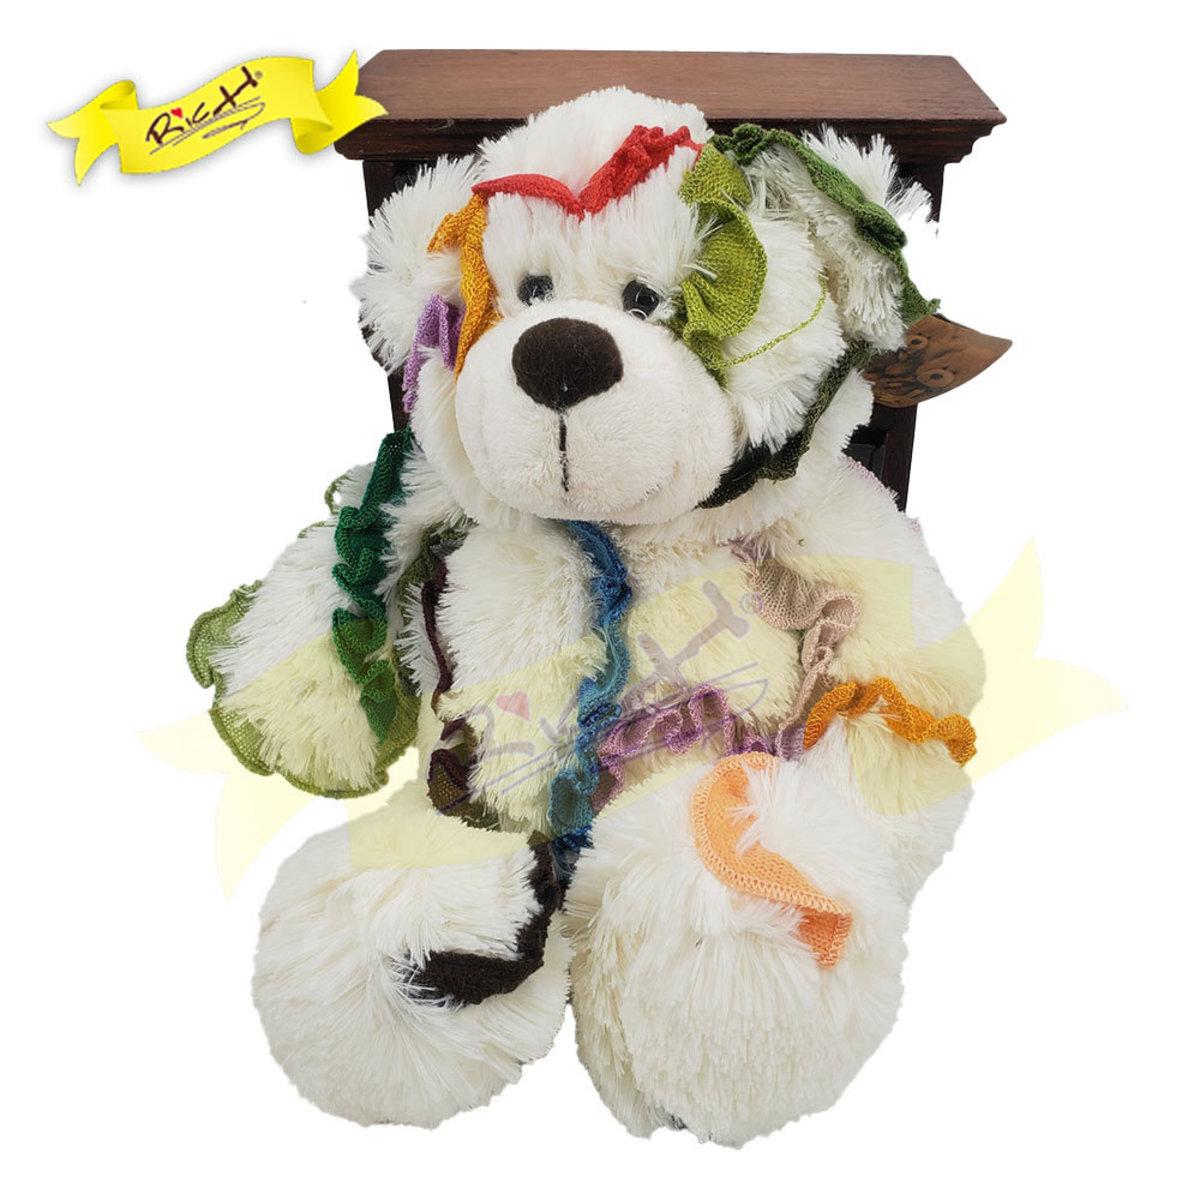 Color Rich - Rainbow Ribbon Patchwork Bear